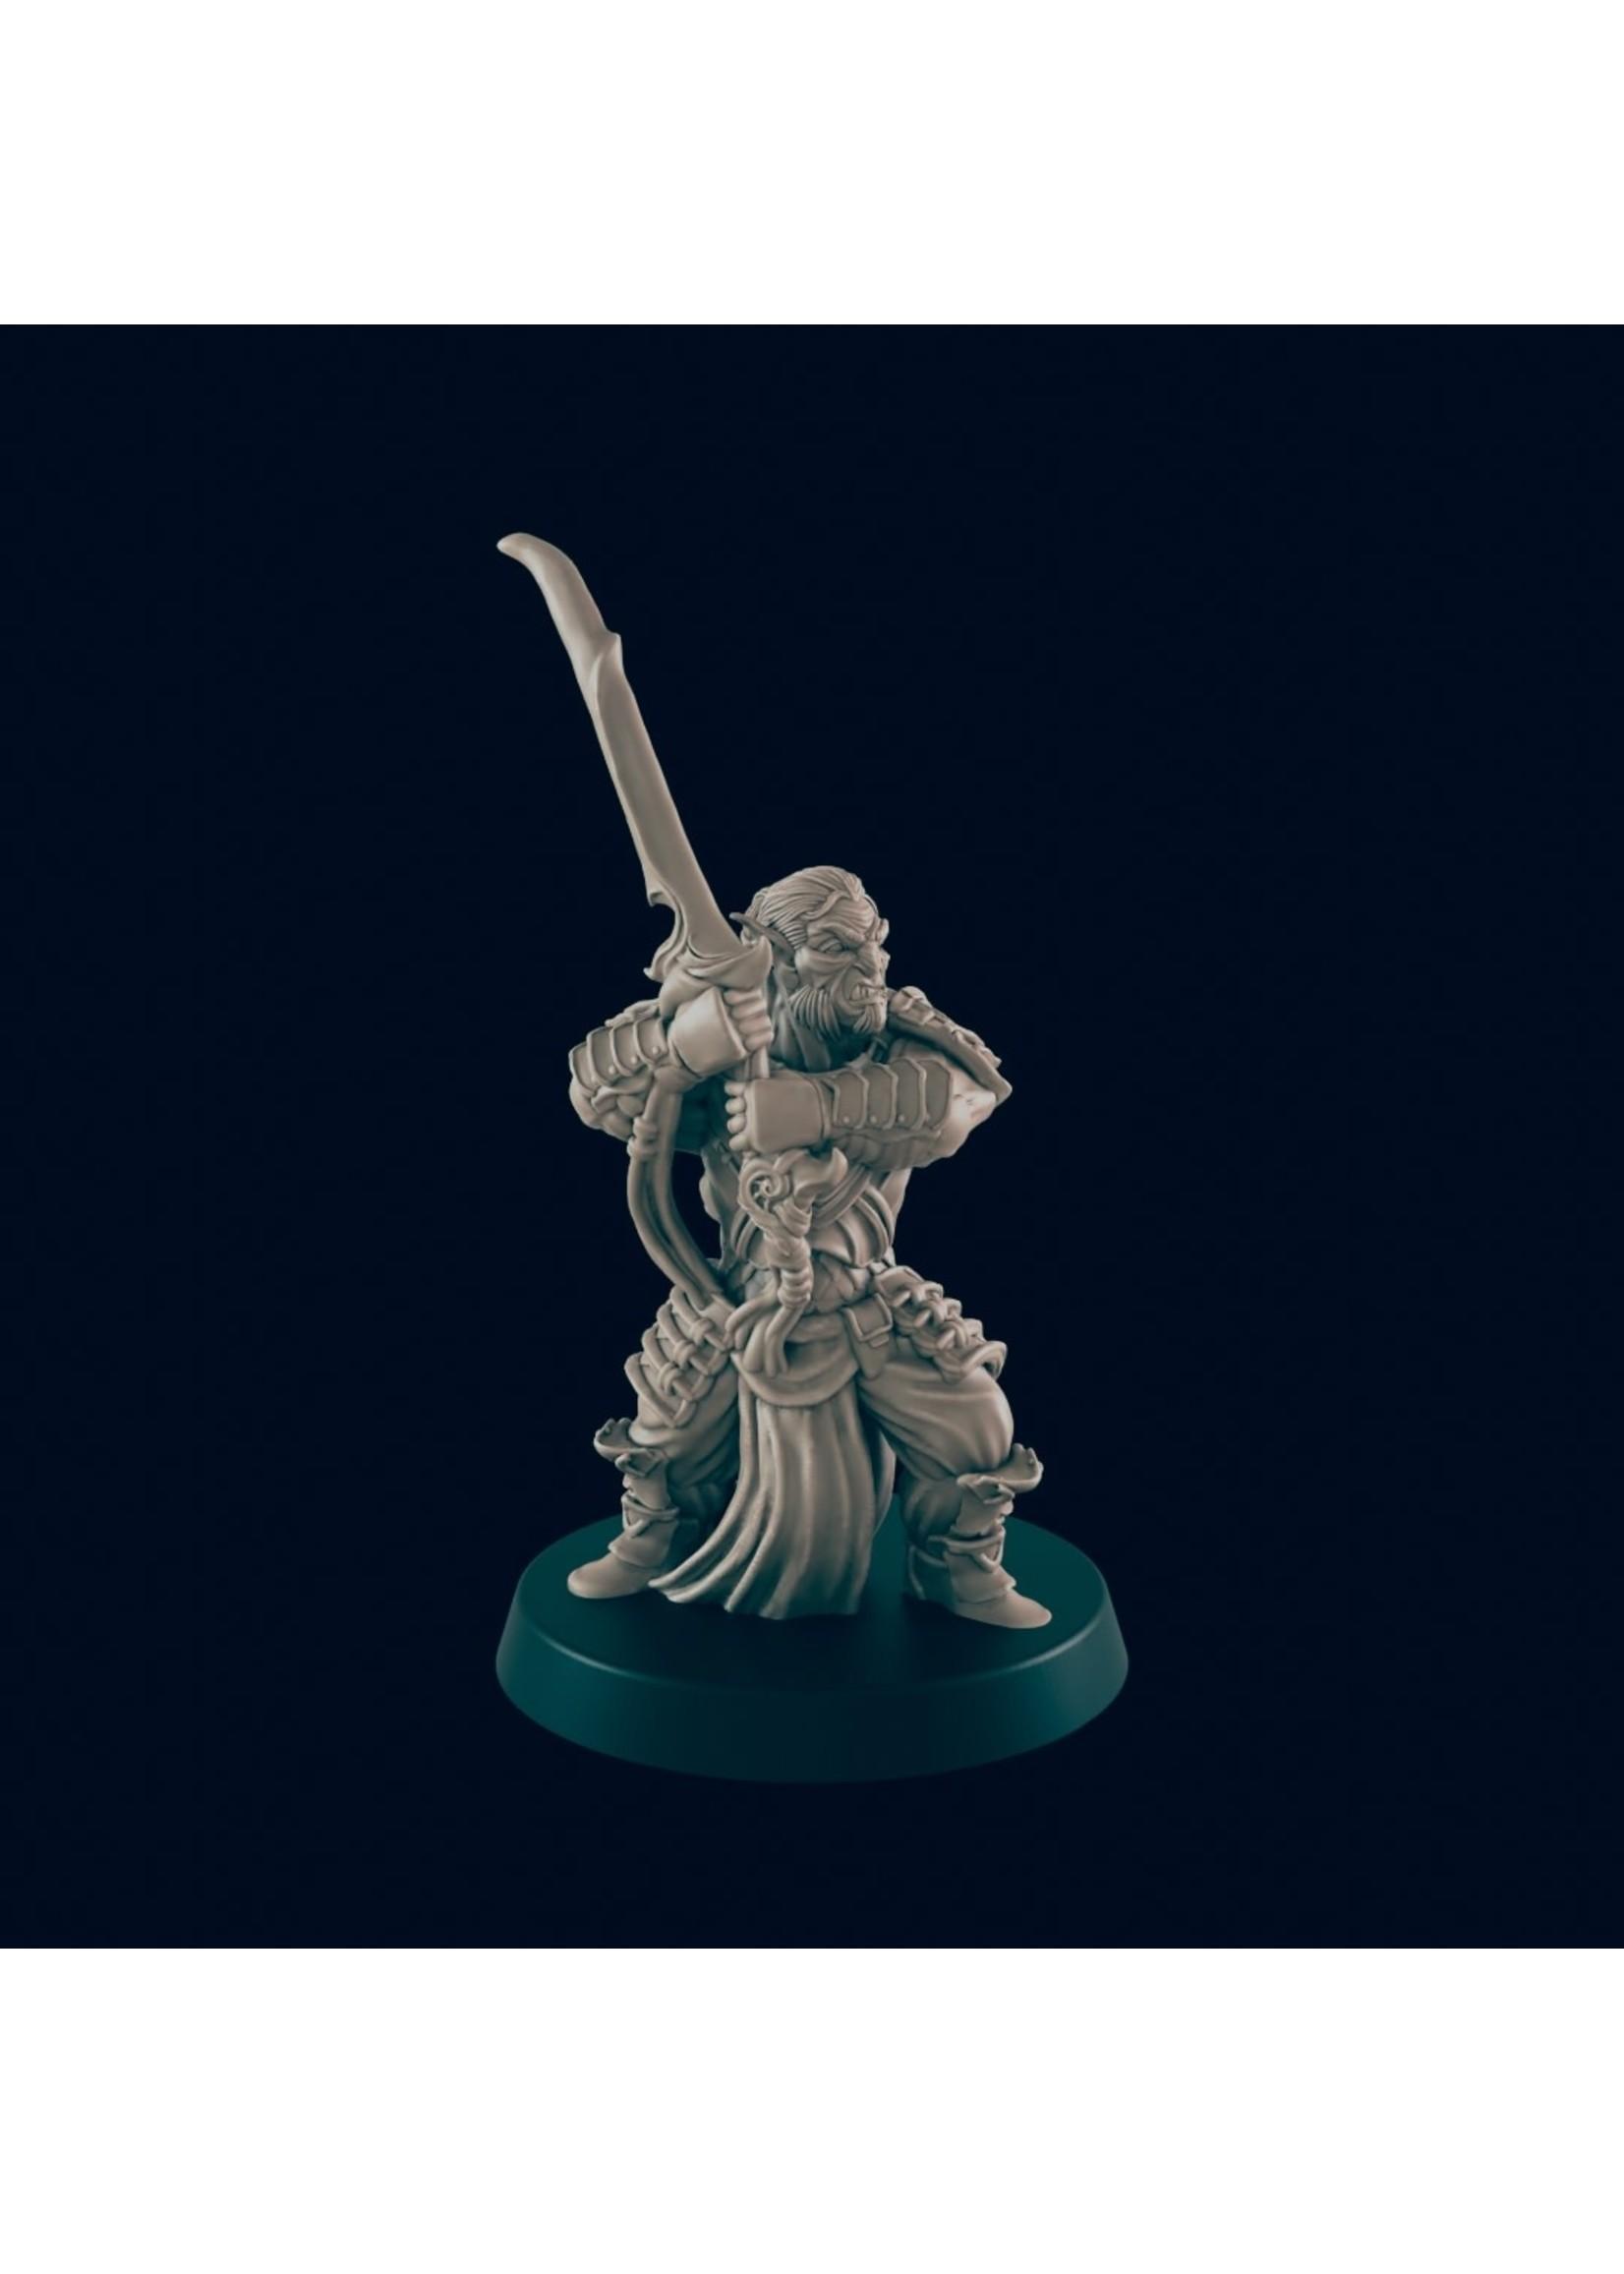 3D Printed Miniature - Hobgoblin 1 - Dungeons & Dragons - Beasts and Baddies KS